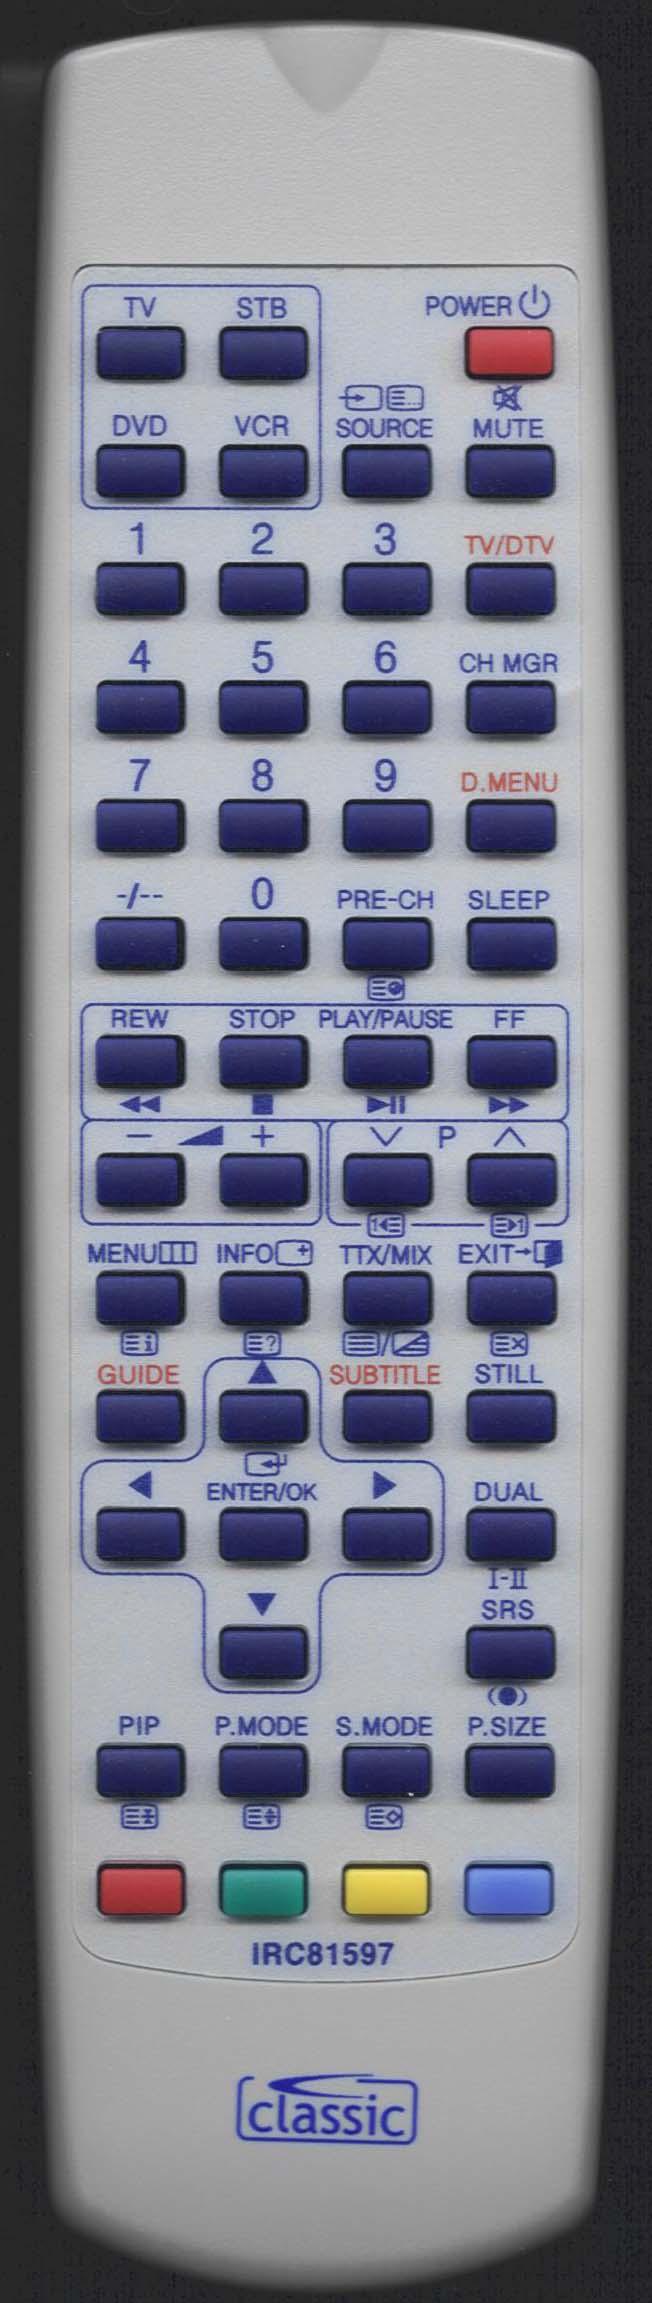 SAMSUNG LE32R73BD Remote Control Alternative